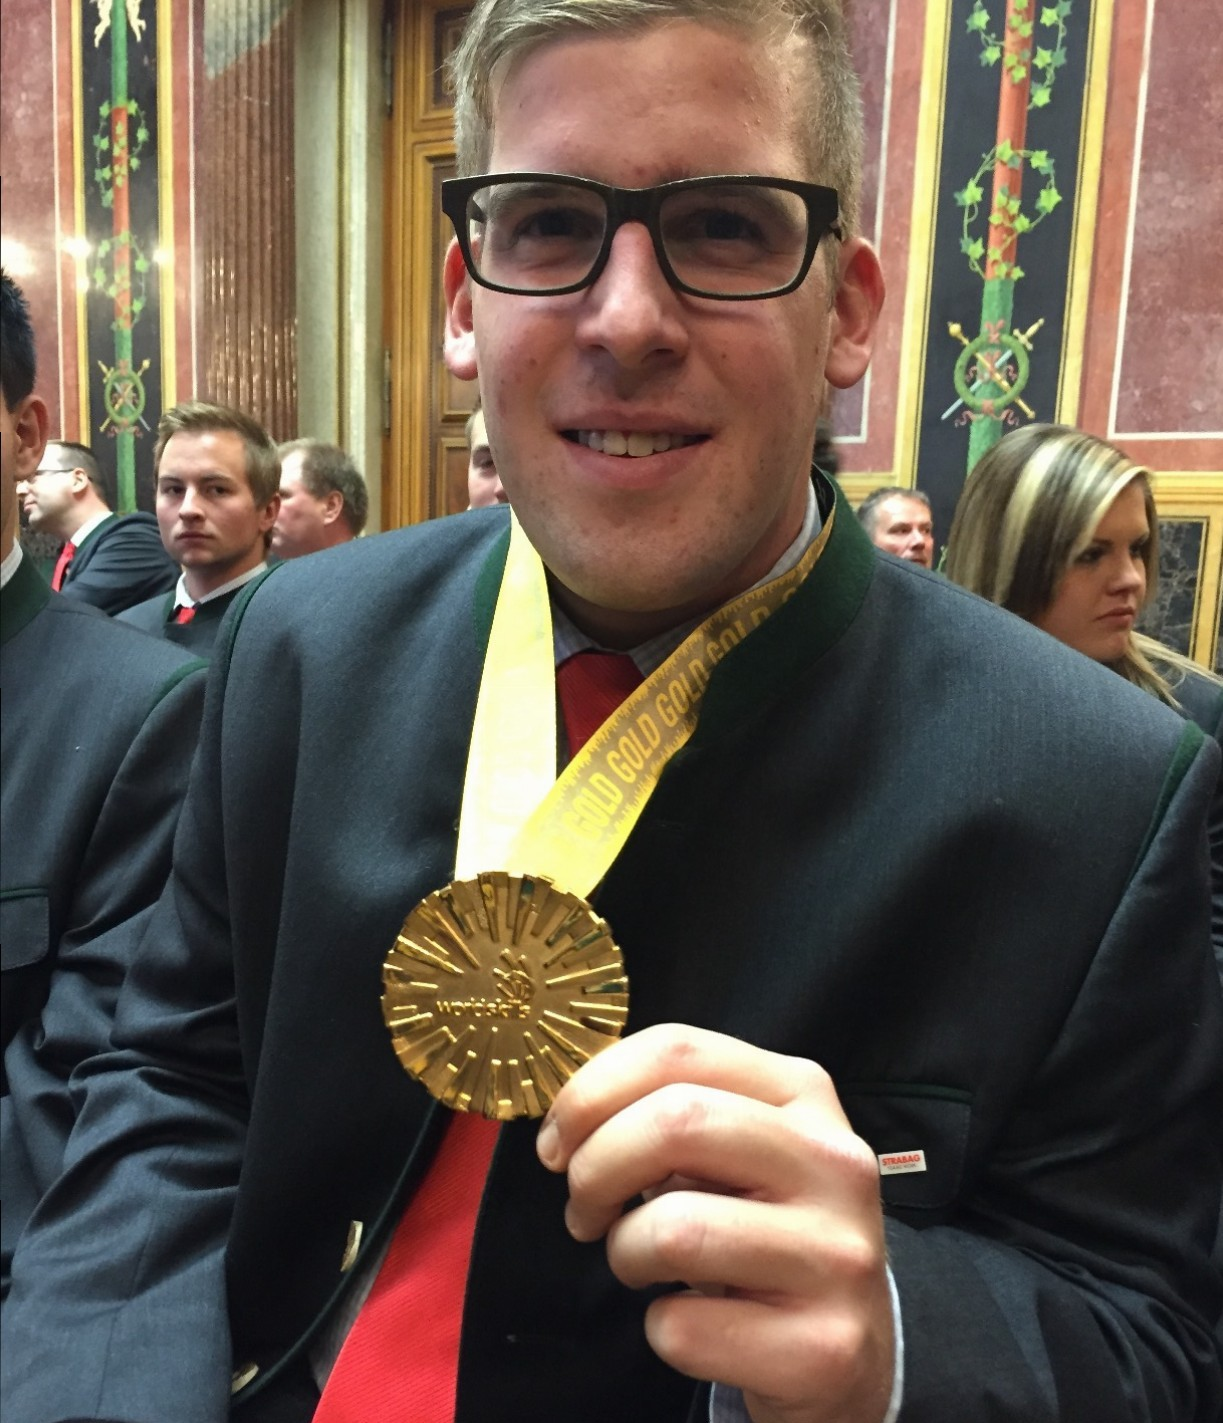 Michael Haydn (Weltmeister im Betonbau) - (c) ÖVP Klub